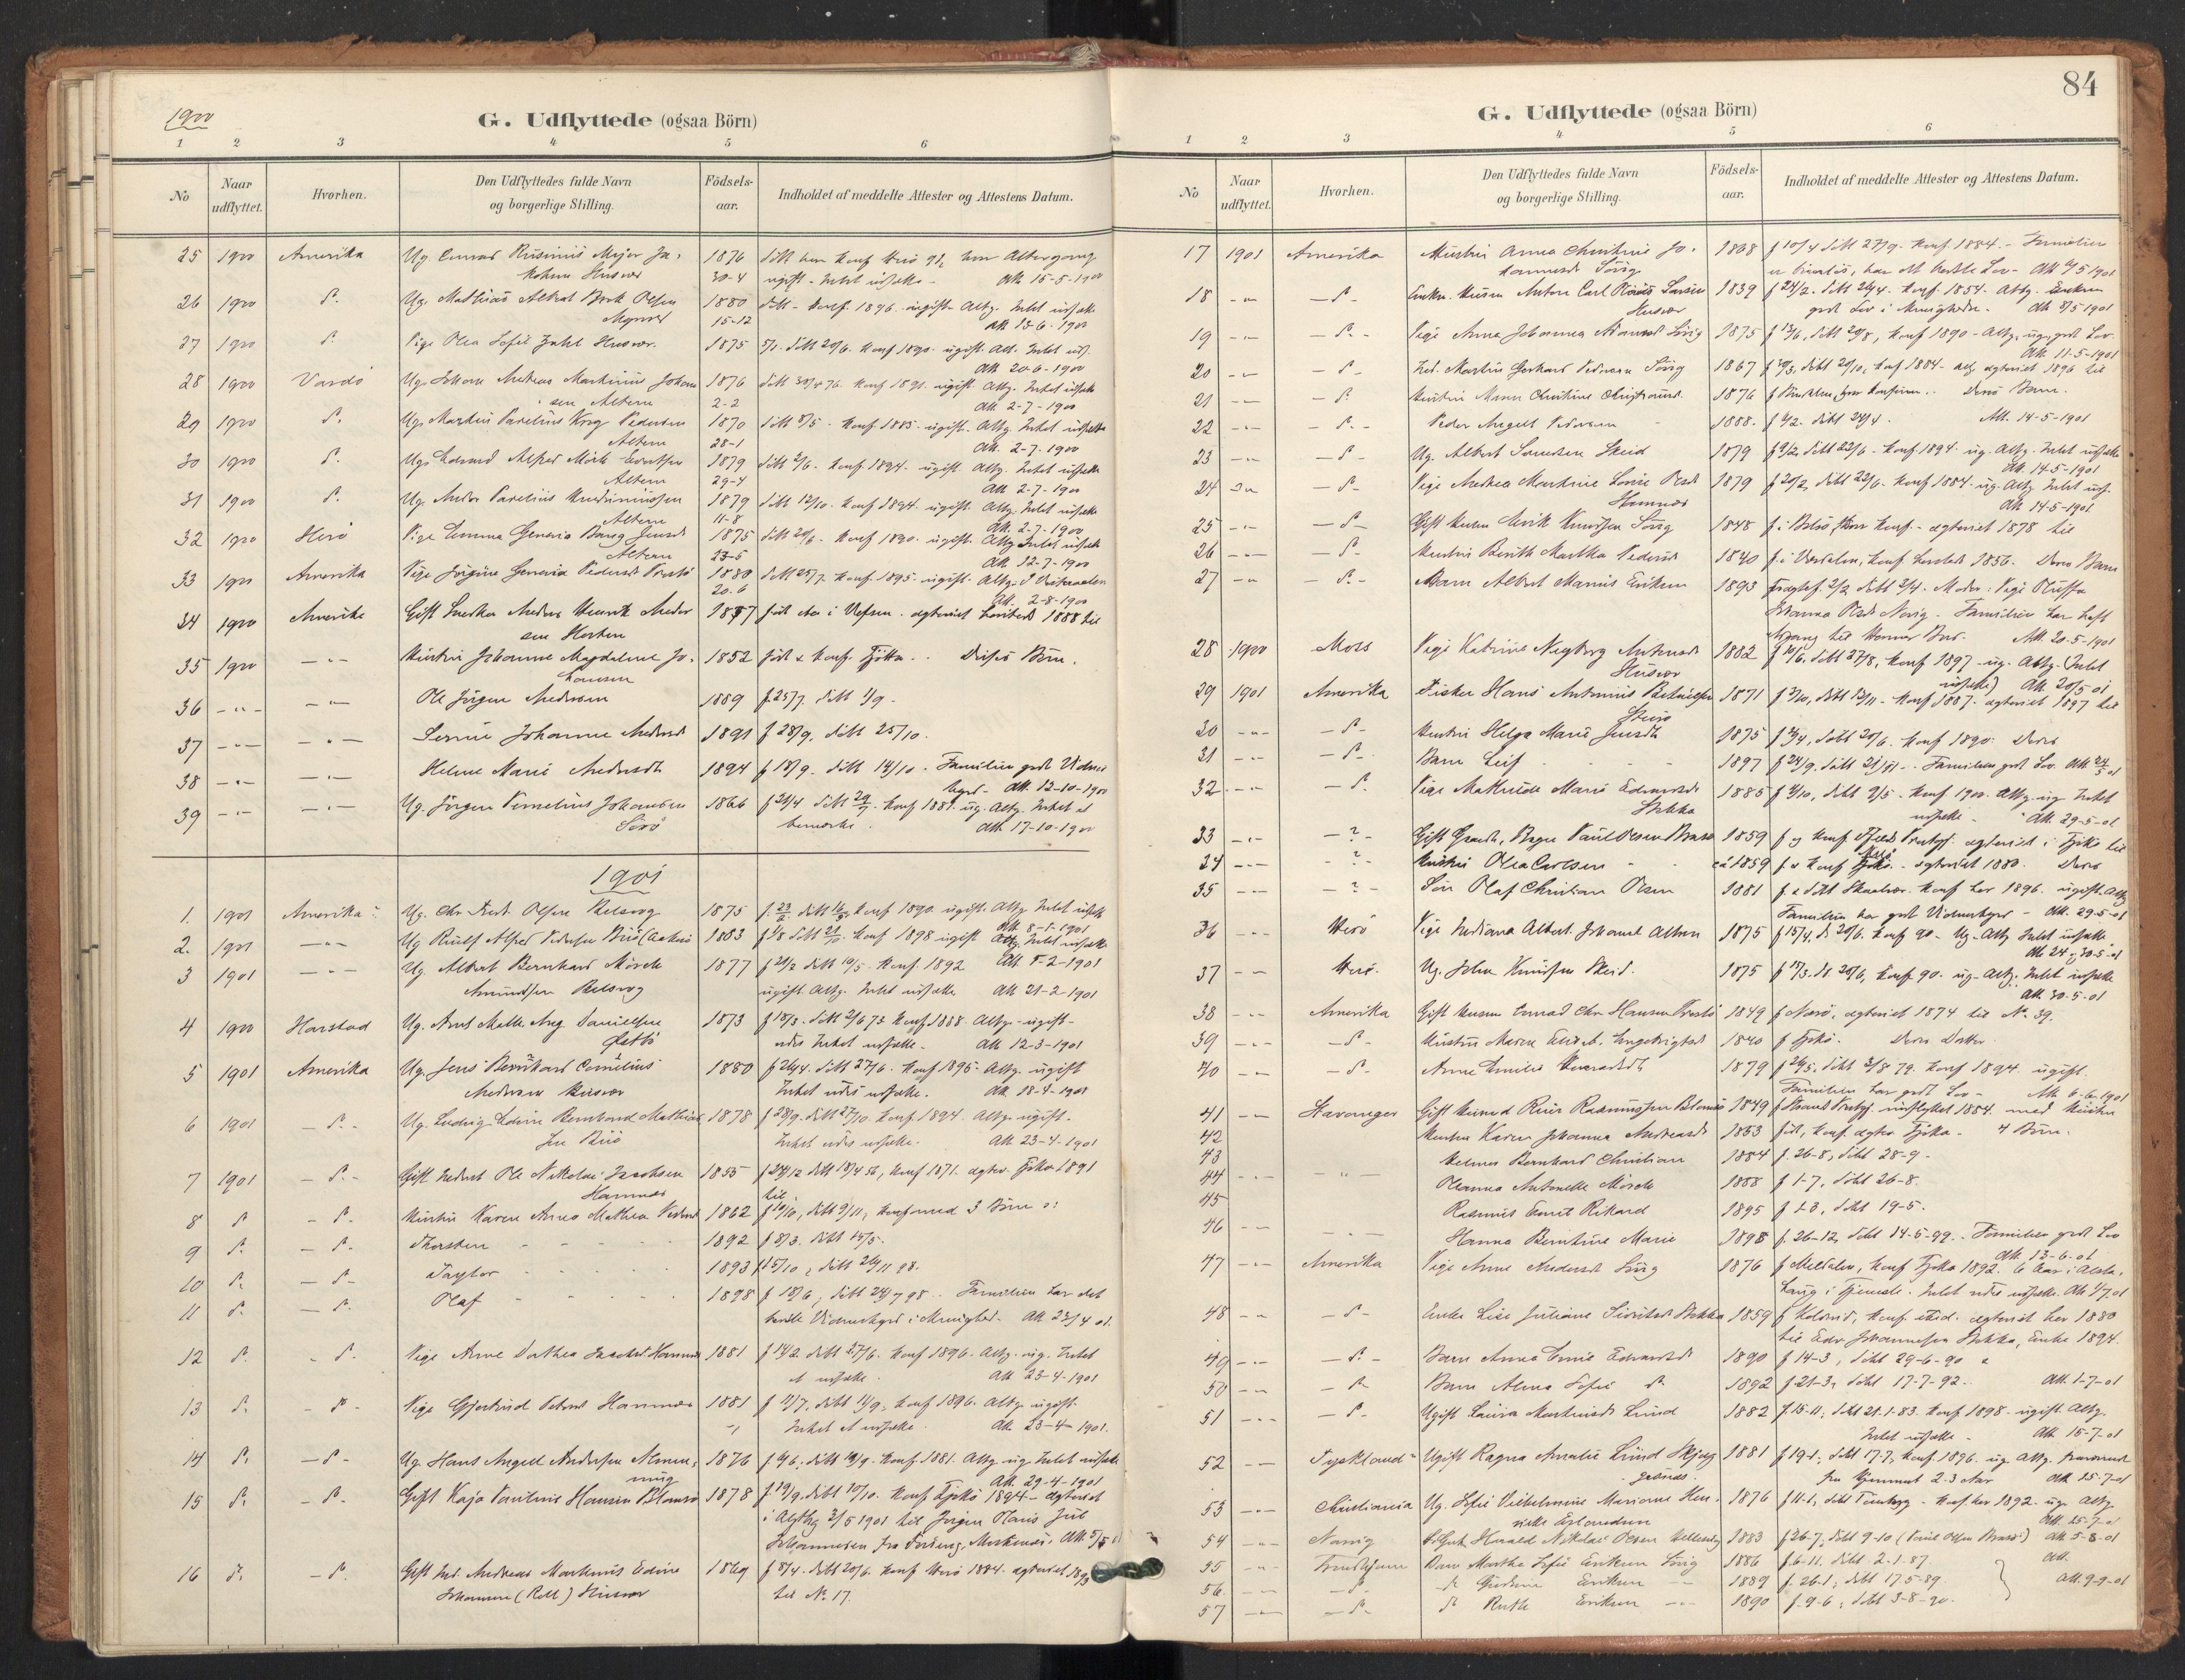 SAT, Ministerialprotokoller, klokkerbøker og fødselsregistre - Nordland, 830/L0454: Ministerialbok nr. 830A18, 1897-1913, s. 84